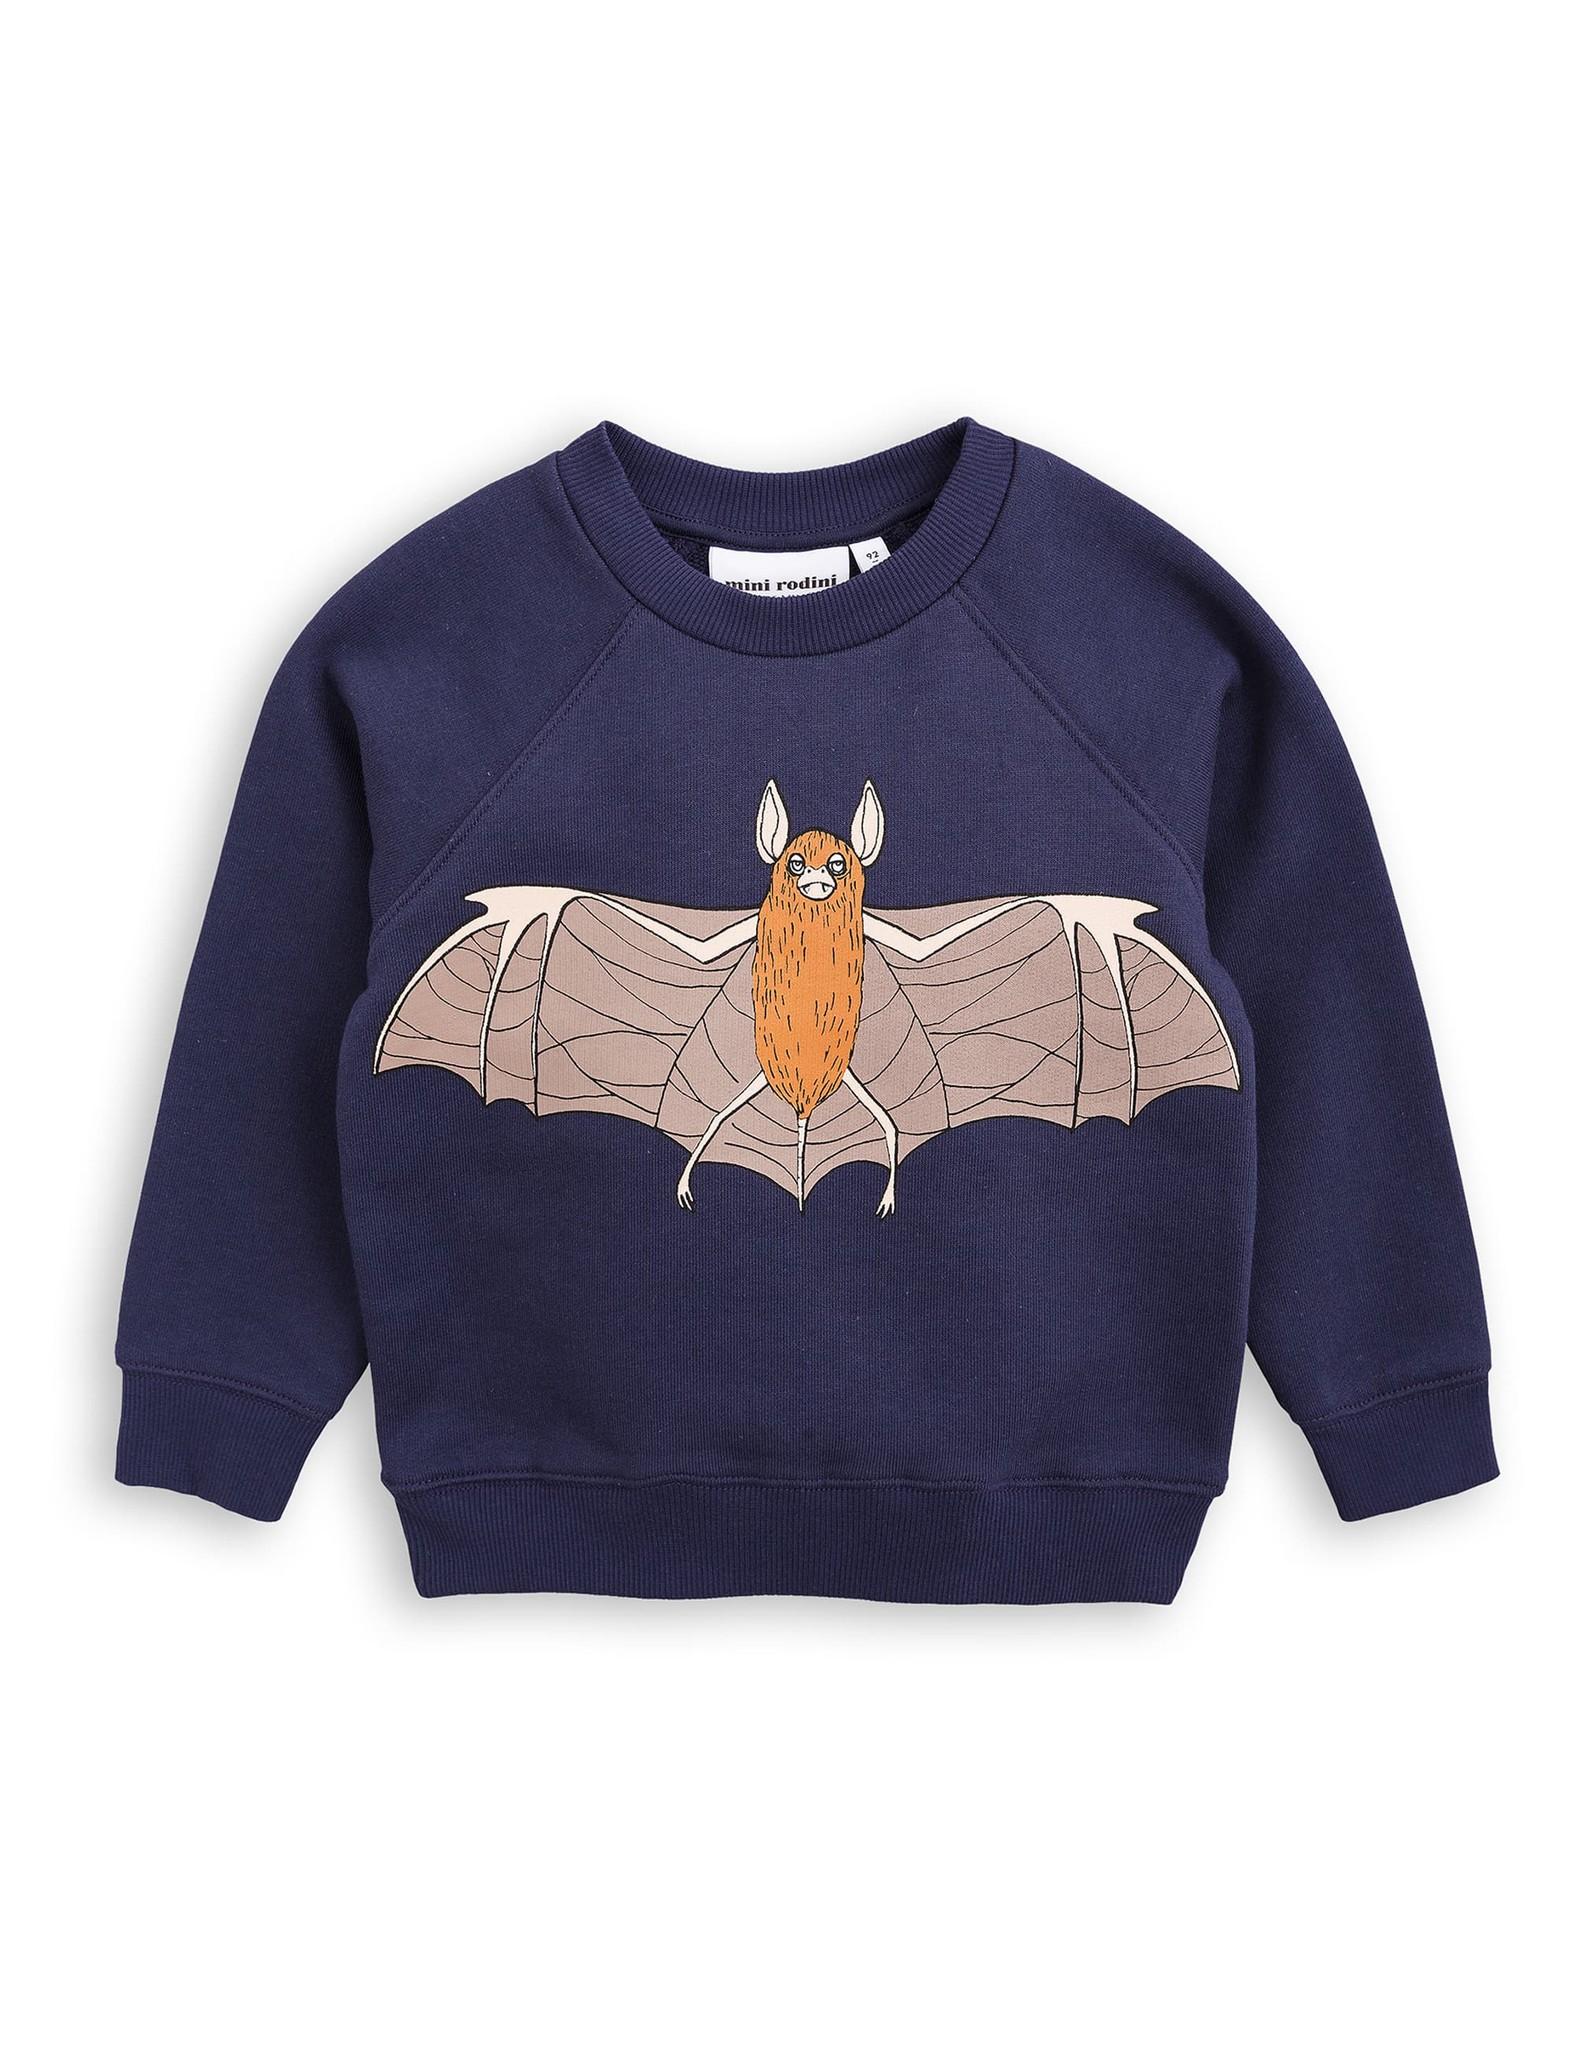 Mini Rodini Flying Bat sweater